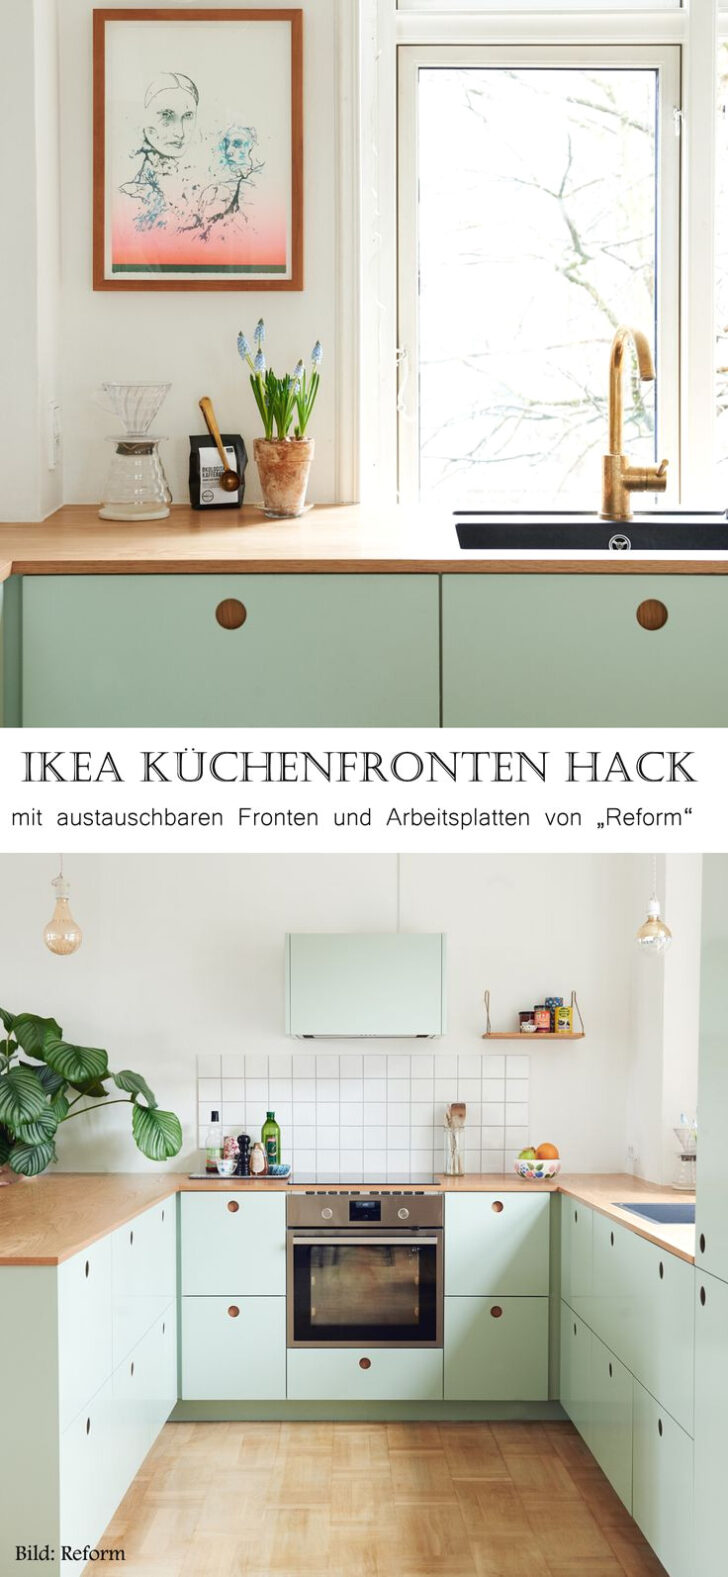 Medium Size of Ikea Singleküche Värde Ideen Kche 99 Top Ebay Miniküche Betten 160x200 Küche Kosten Modulküche Mit E Geräten Kühlschrank Sofa Schlaffunktion Kaufen Bei Wohnzimmer Ikea Singleküche Värde